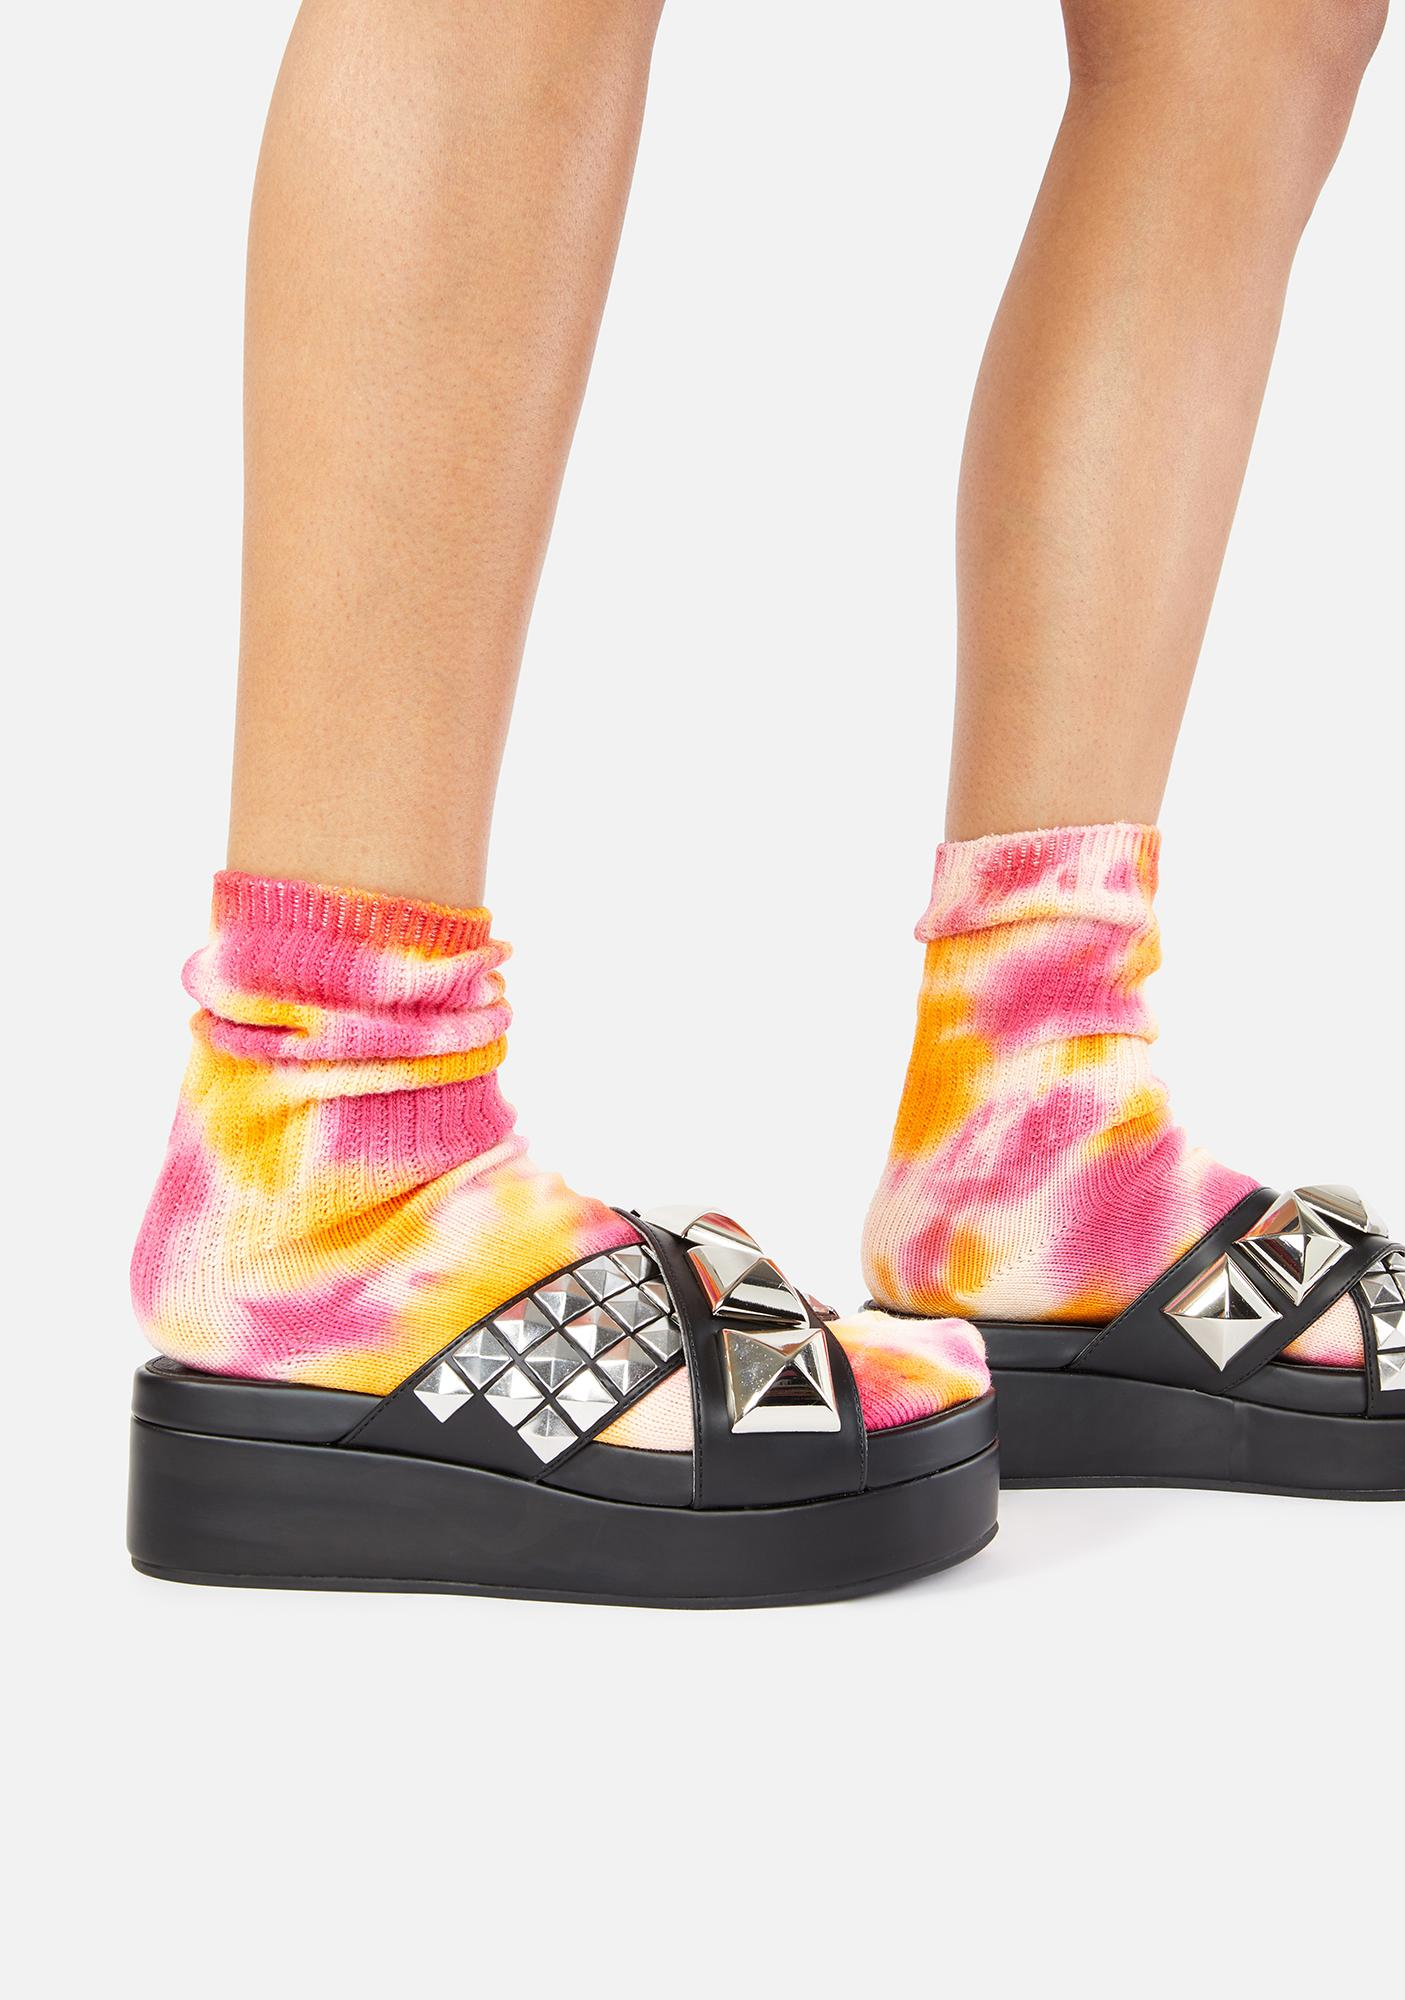 Charla Tedrick Radio Havana Slide Sandals